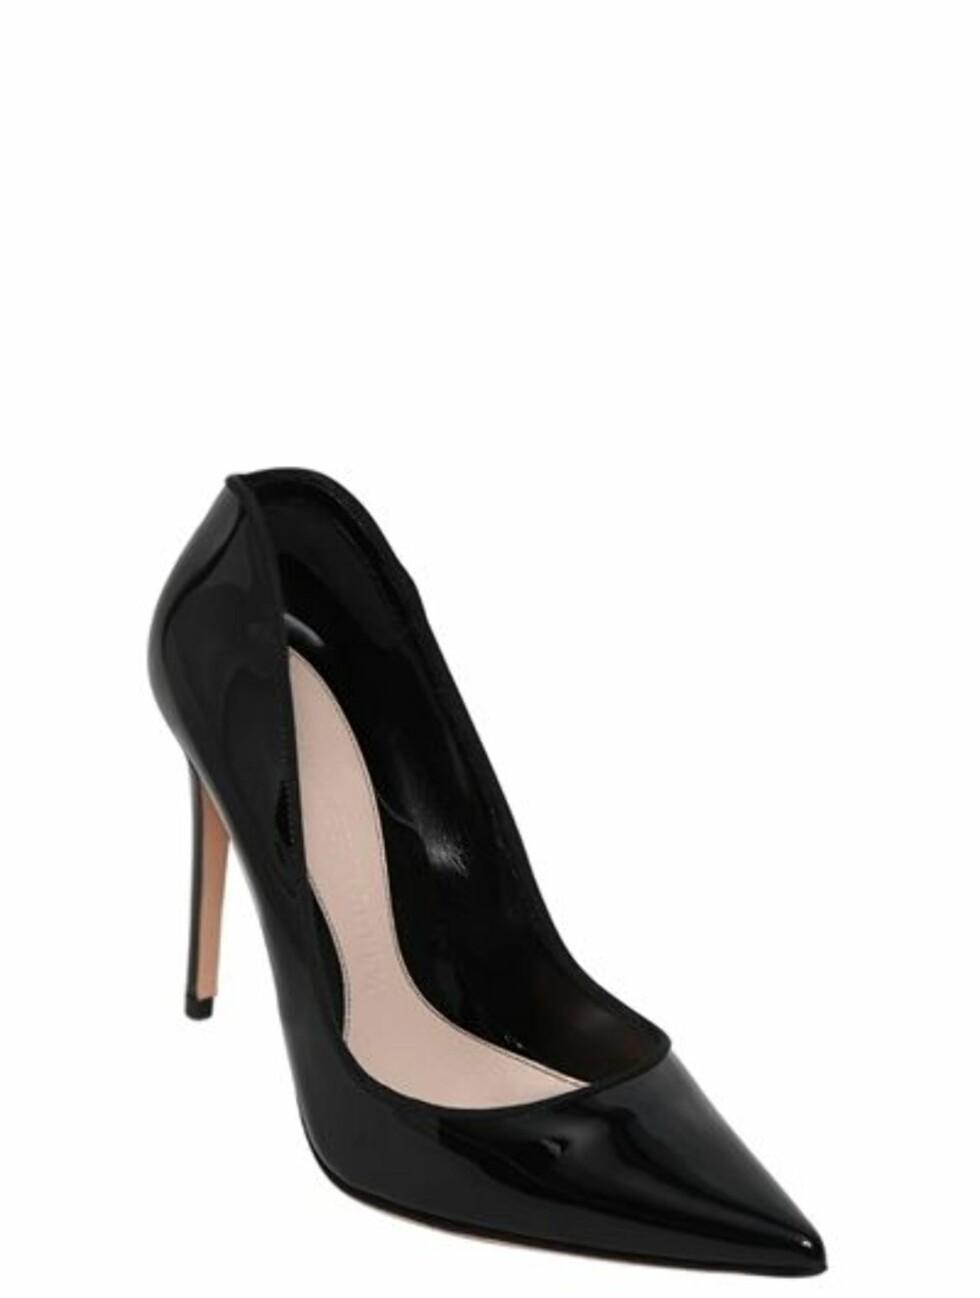 Sko fra Alexander McQueen |3849,-| https://www.luisaviaroma.com/en-no/p/alexander-mcqueen/women/pumps/66I-G14004?ColorId=MTAwMA2&SubLine=shoes&CategoryId=95&lvrid=_p_d146_gw_c95